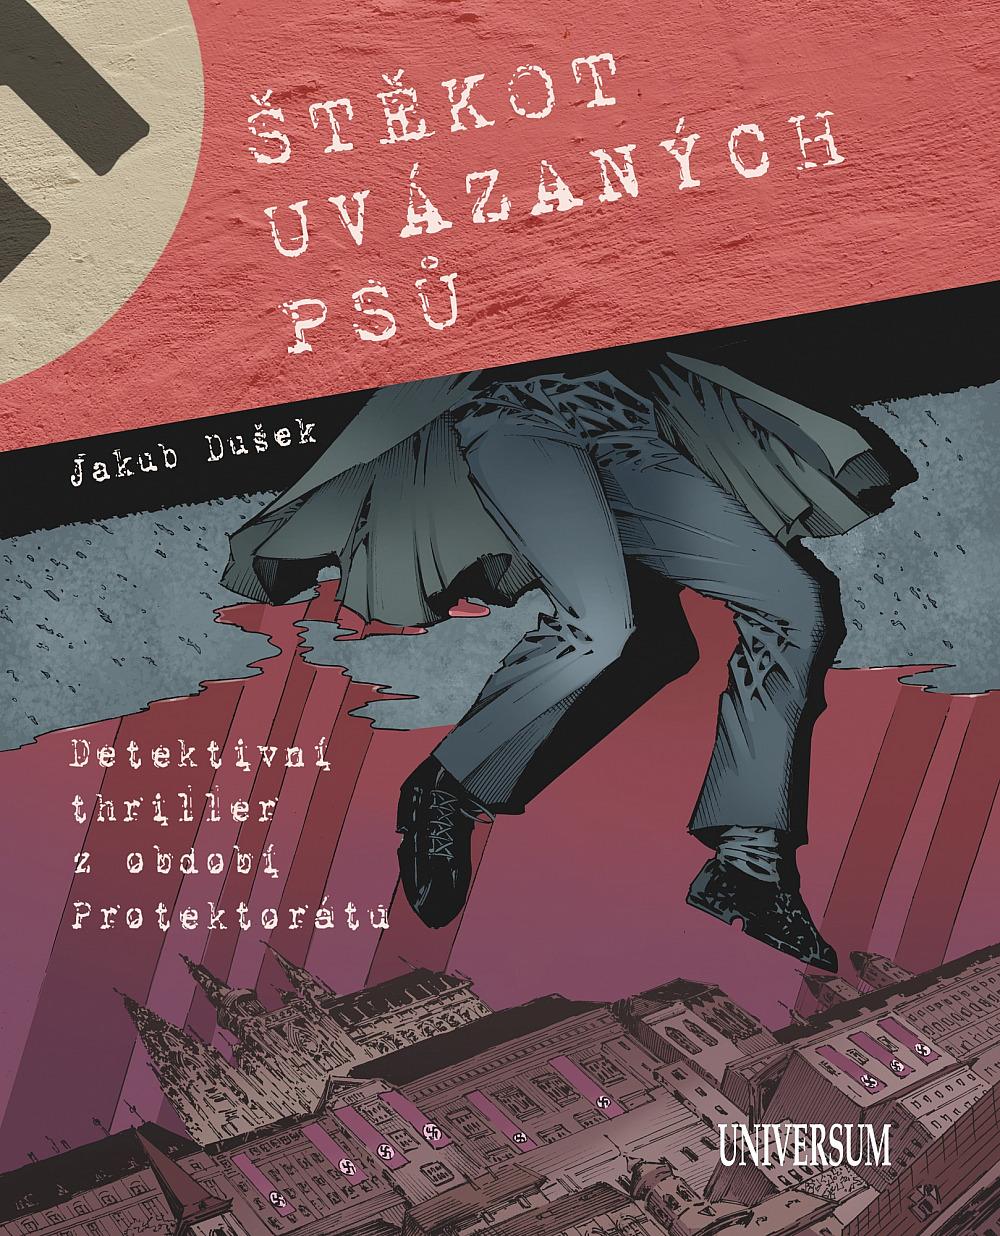 big_stekot-uvazanych-psu-BfD-467473